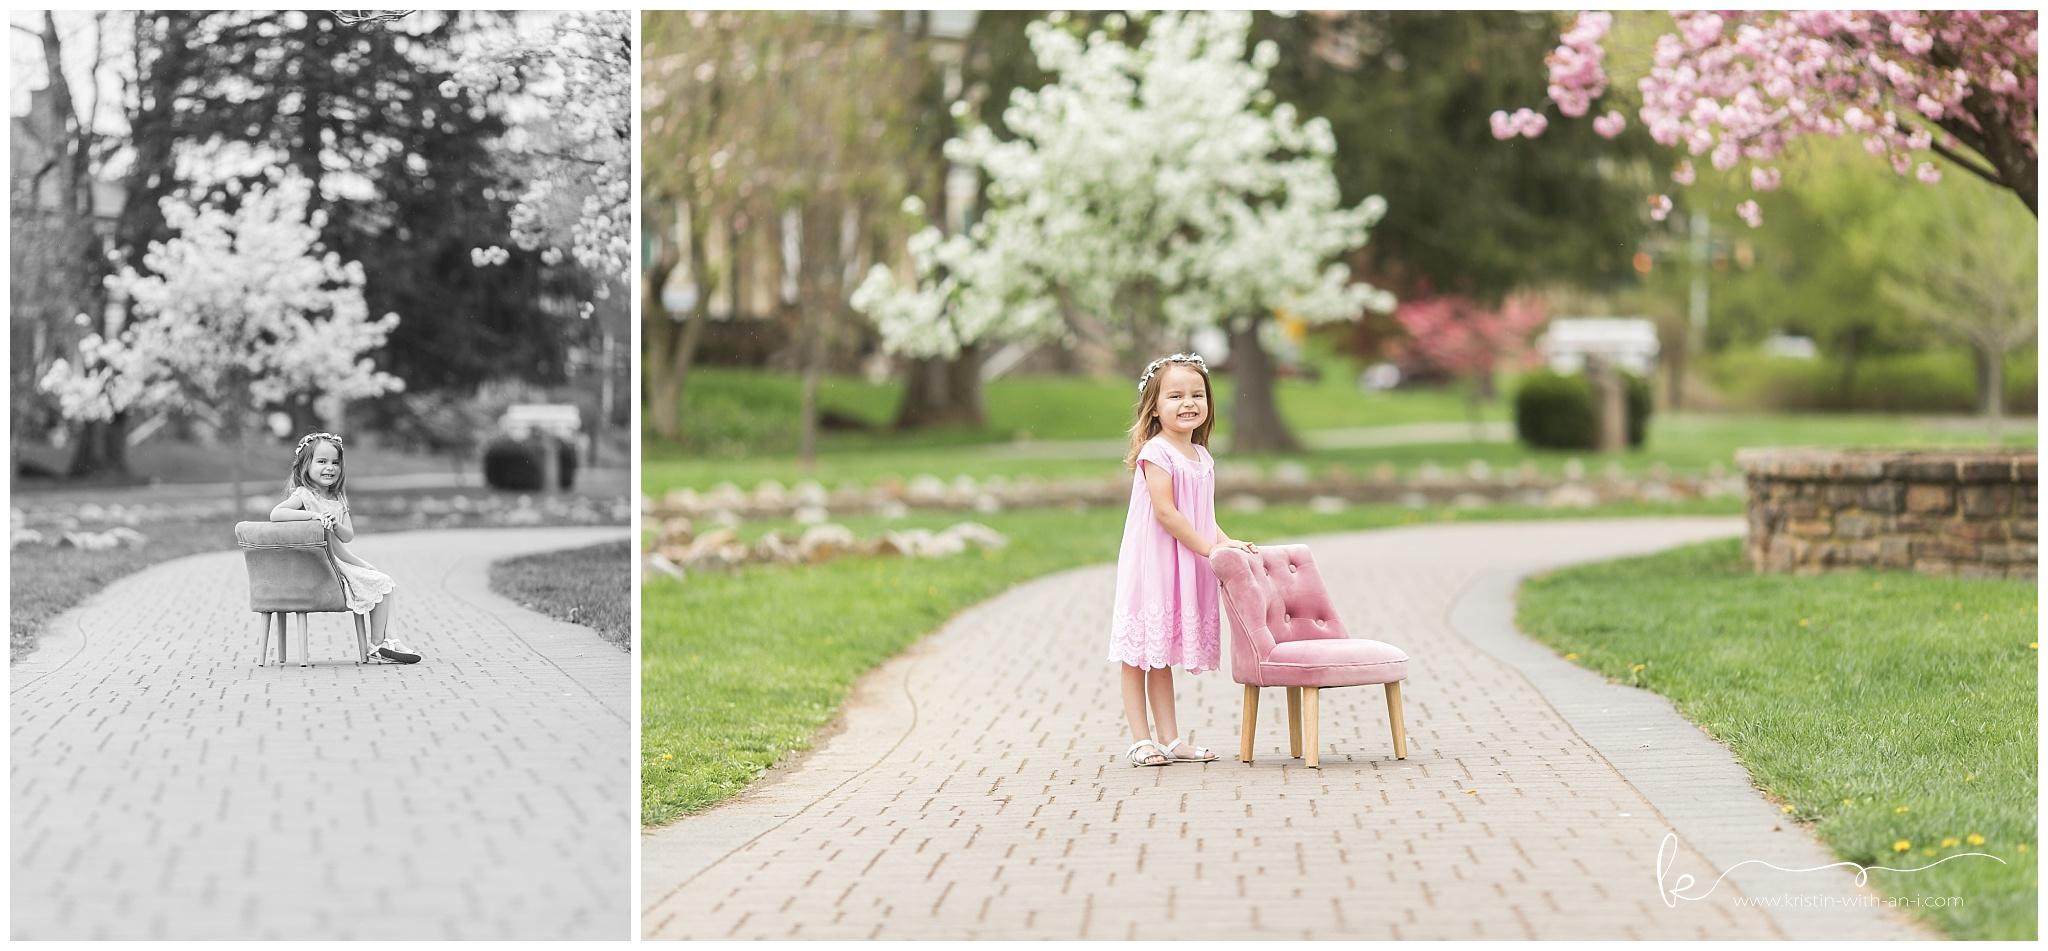 Lehigh Valley Family Photography